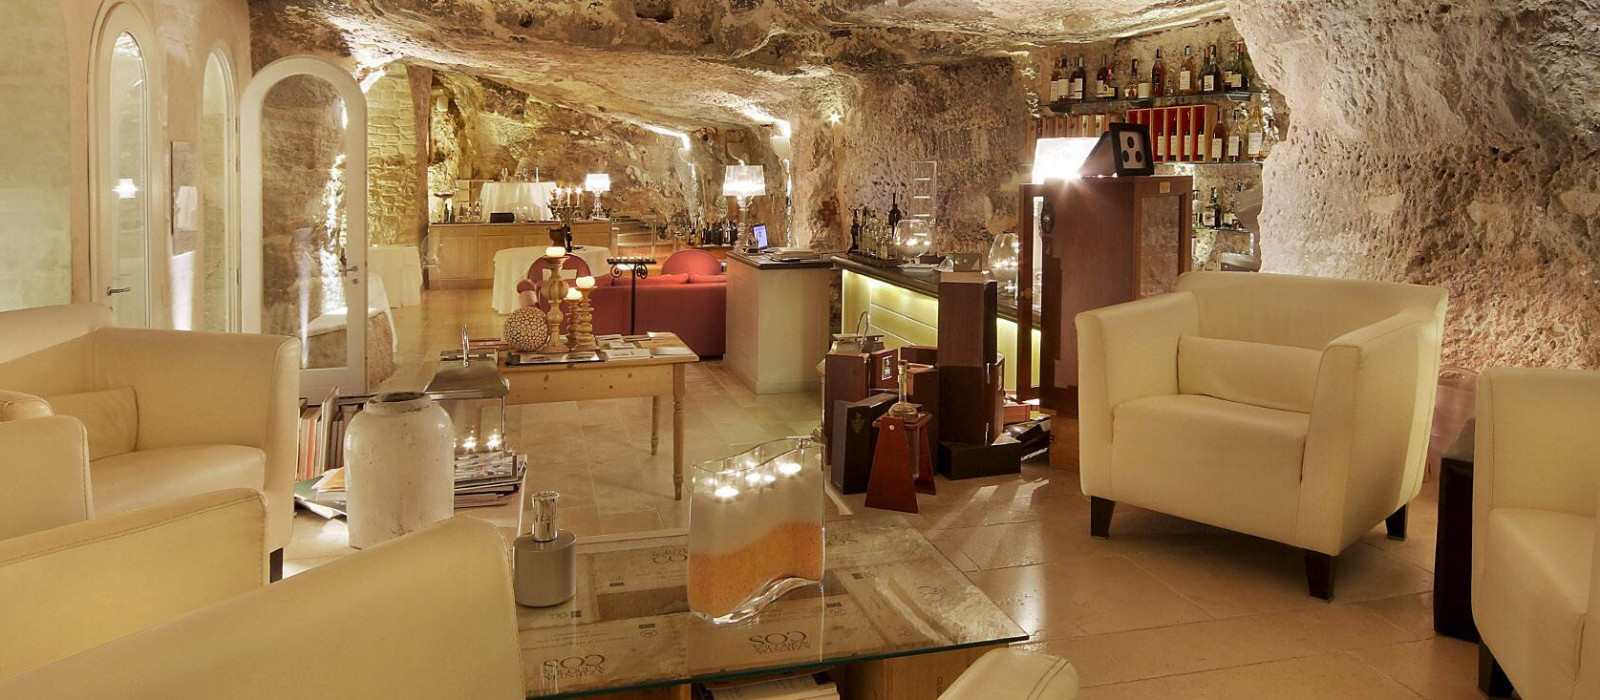 Hotel Locanda Don Serafino Italien